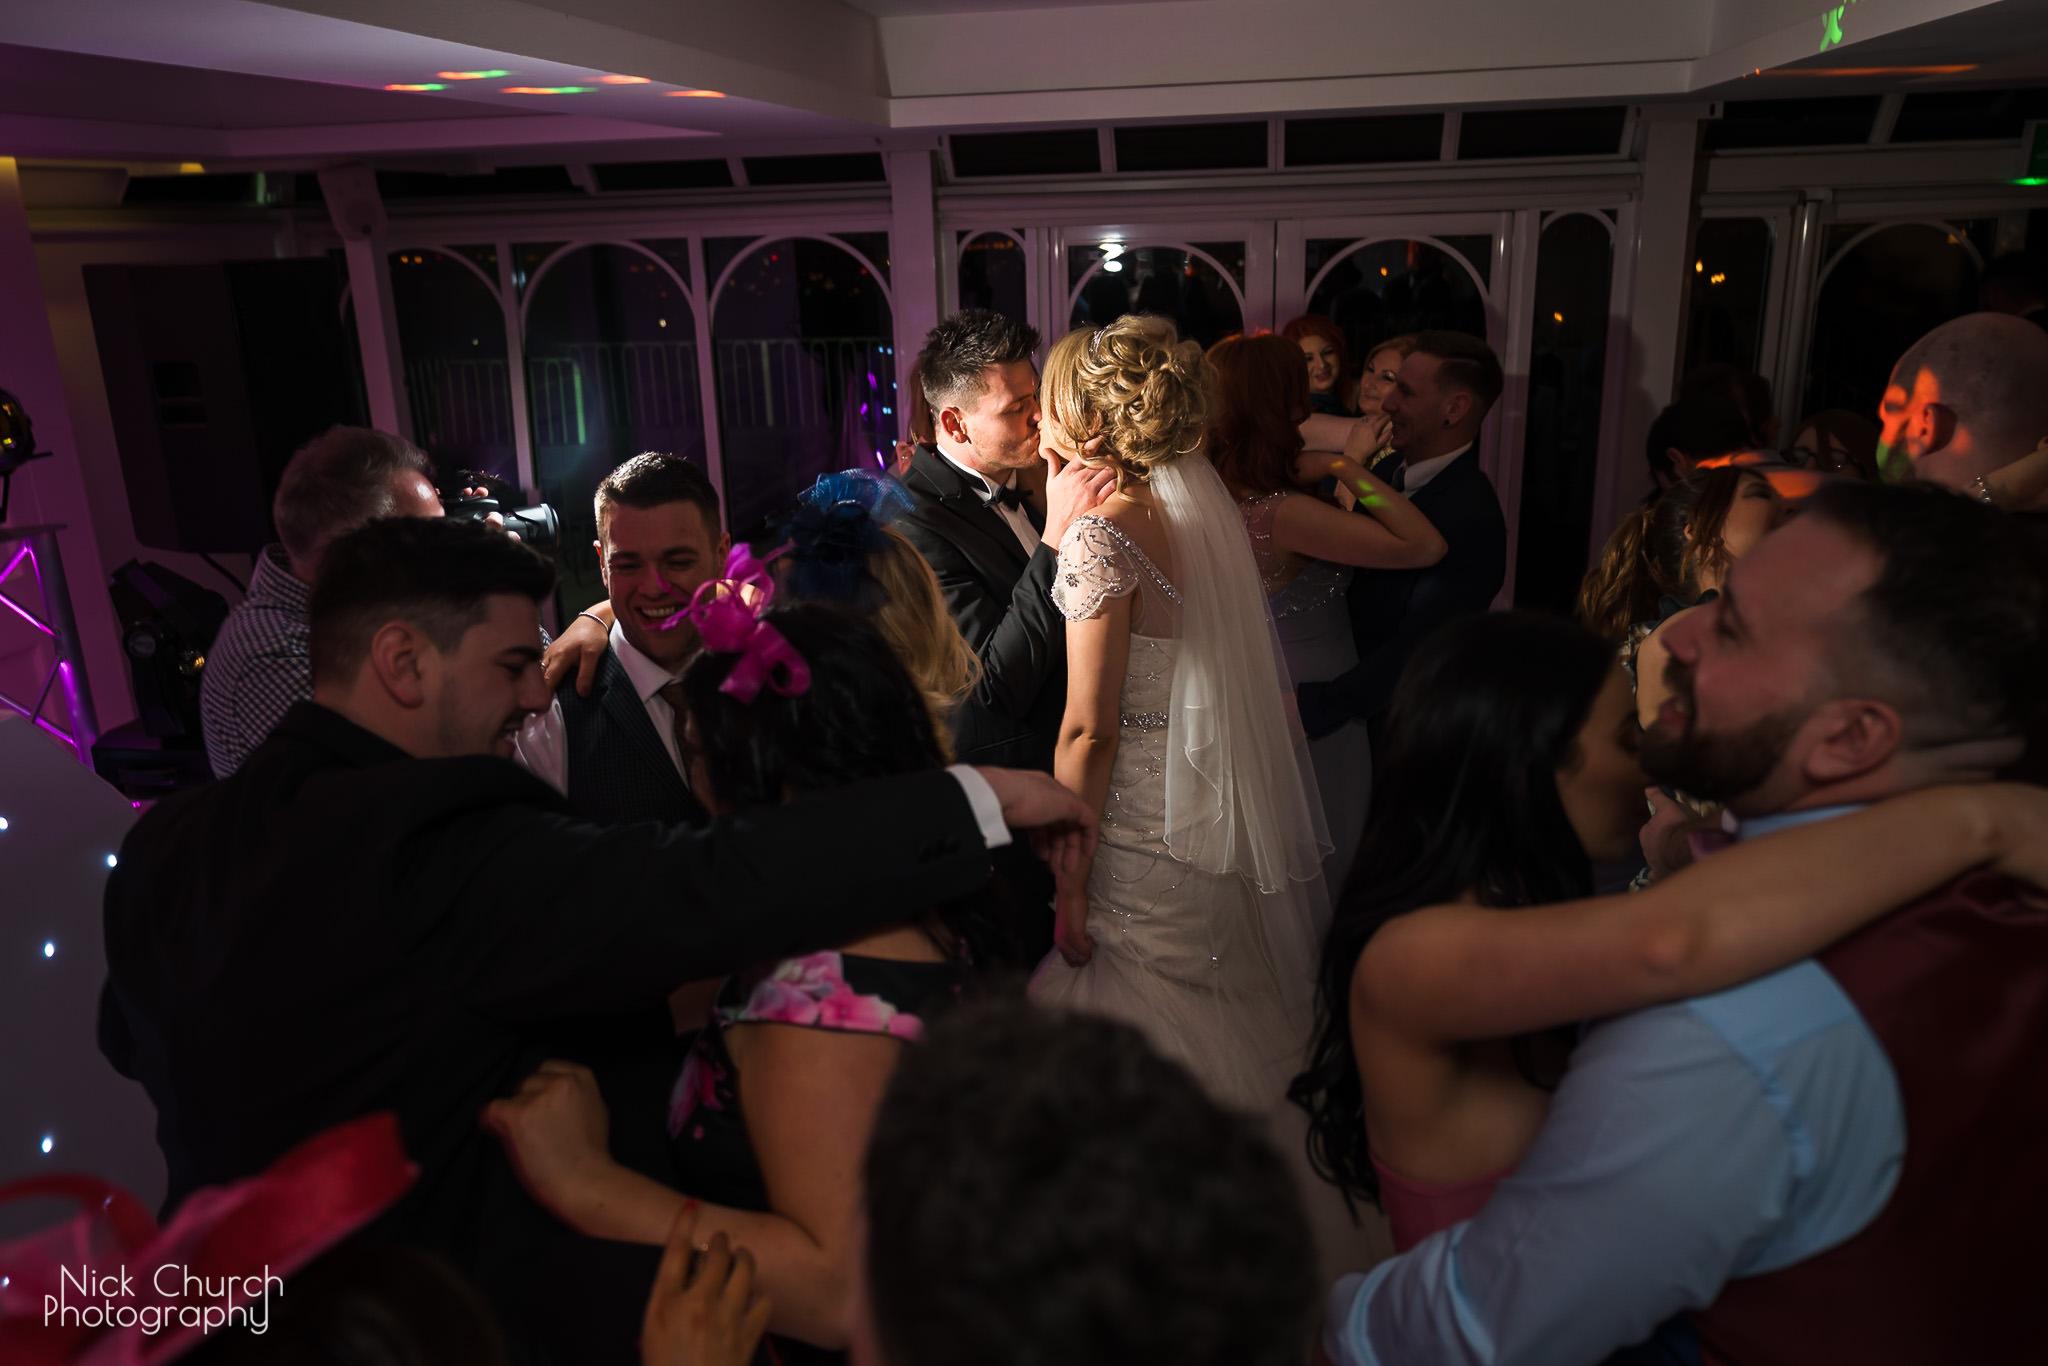 NC-20180317-stacy-and-mike-wedding-2450.jpg